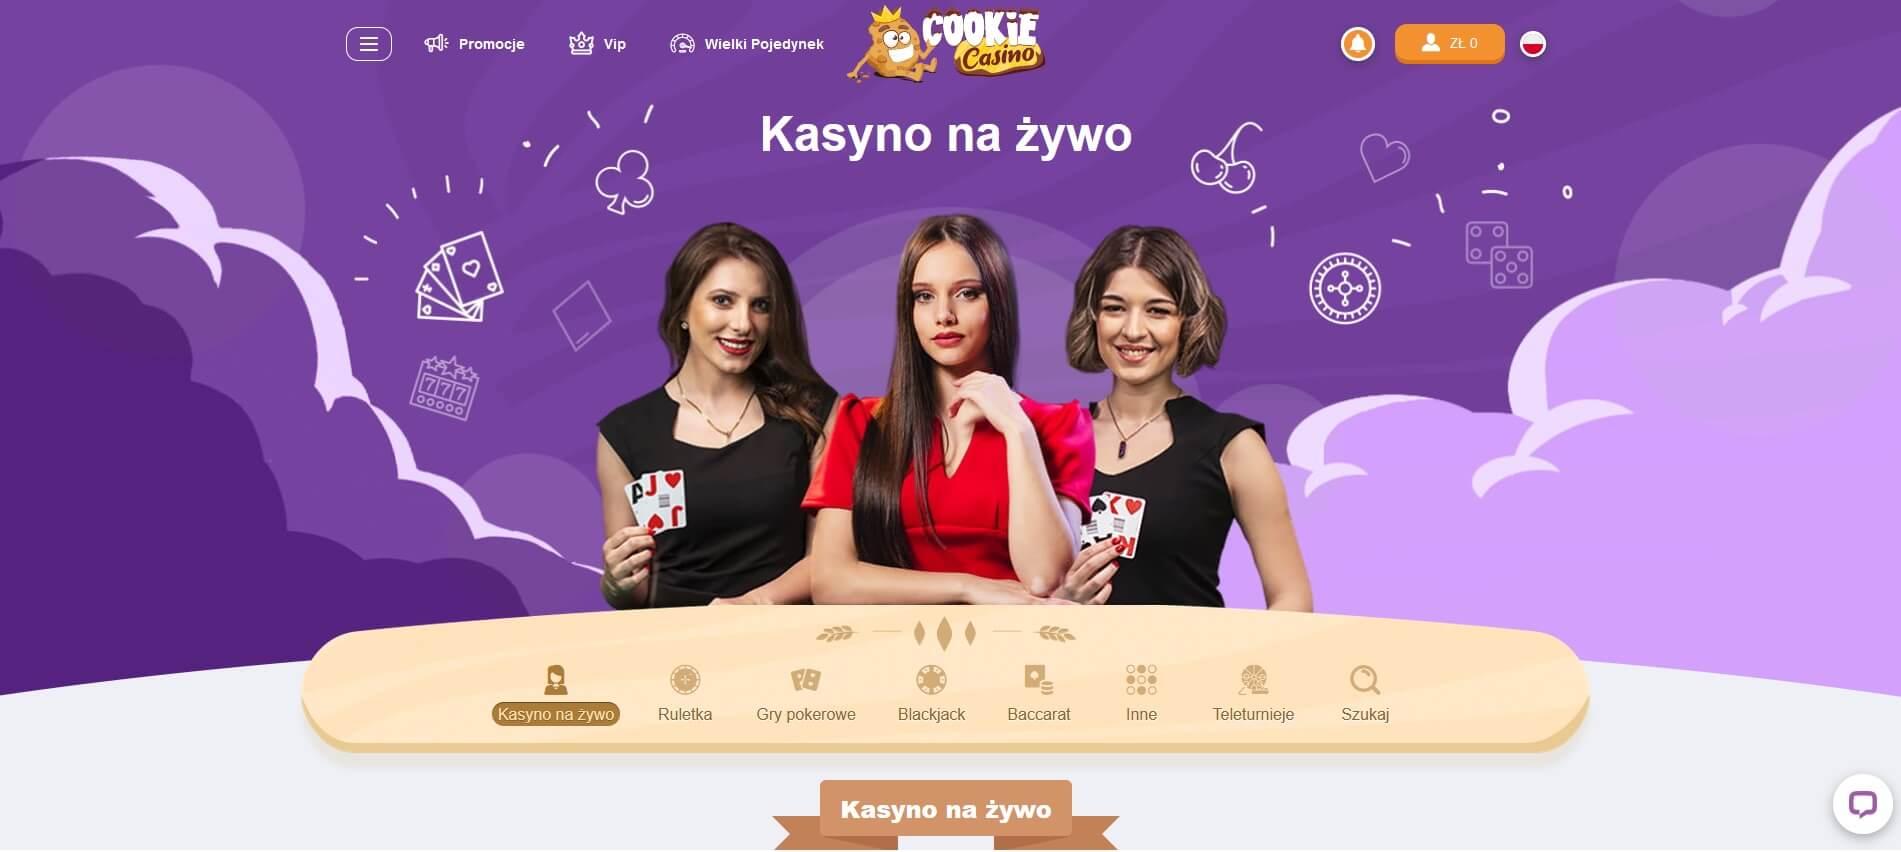 cookie casino live screenshot